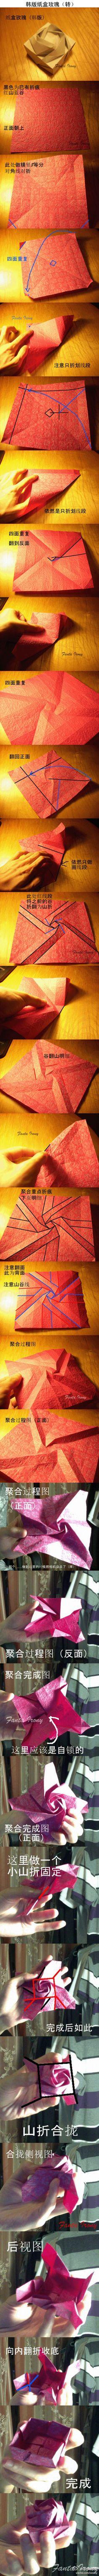 Origami Paper Rose Box